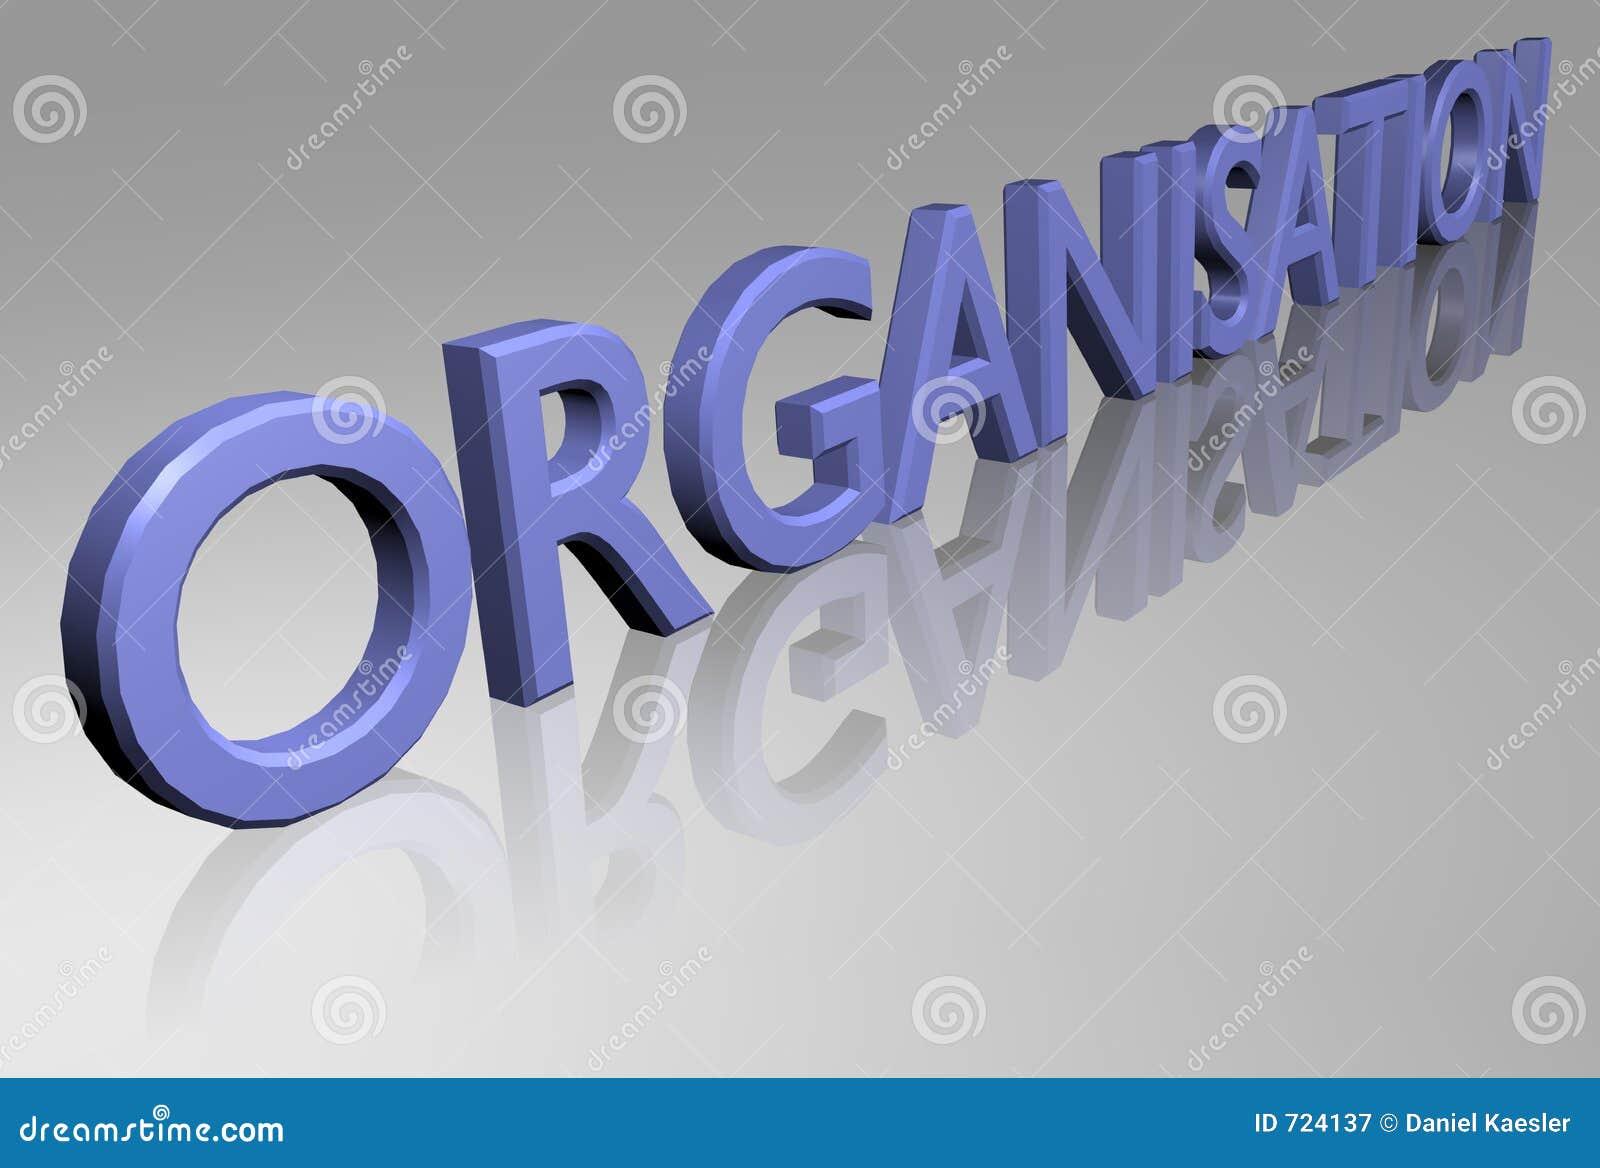 Organisation Royalty Free Stock Photography - Image: 724137